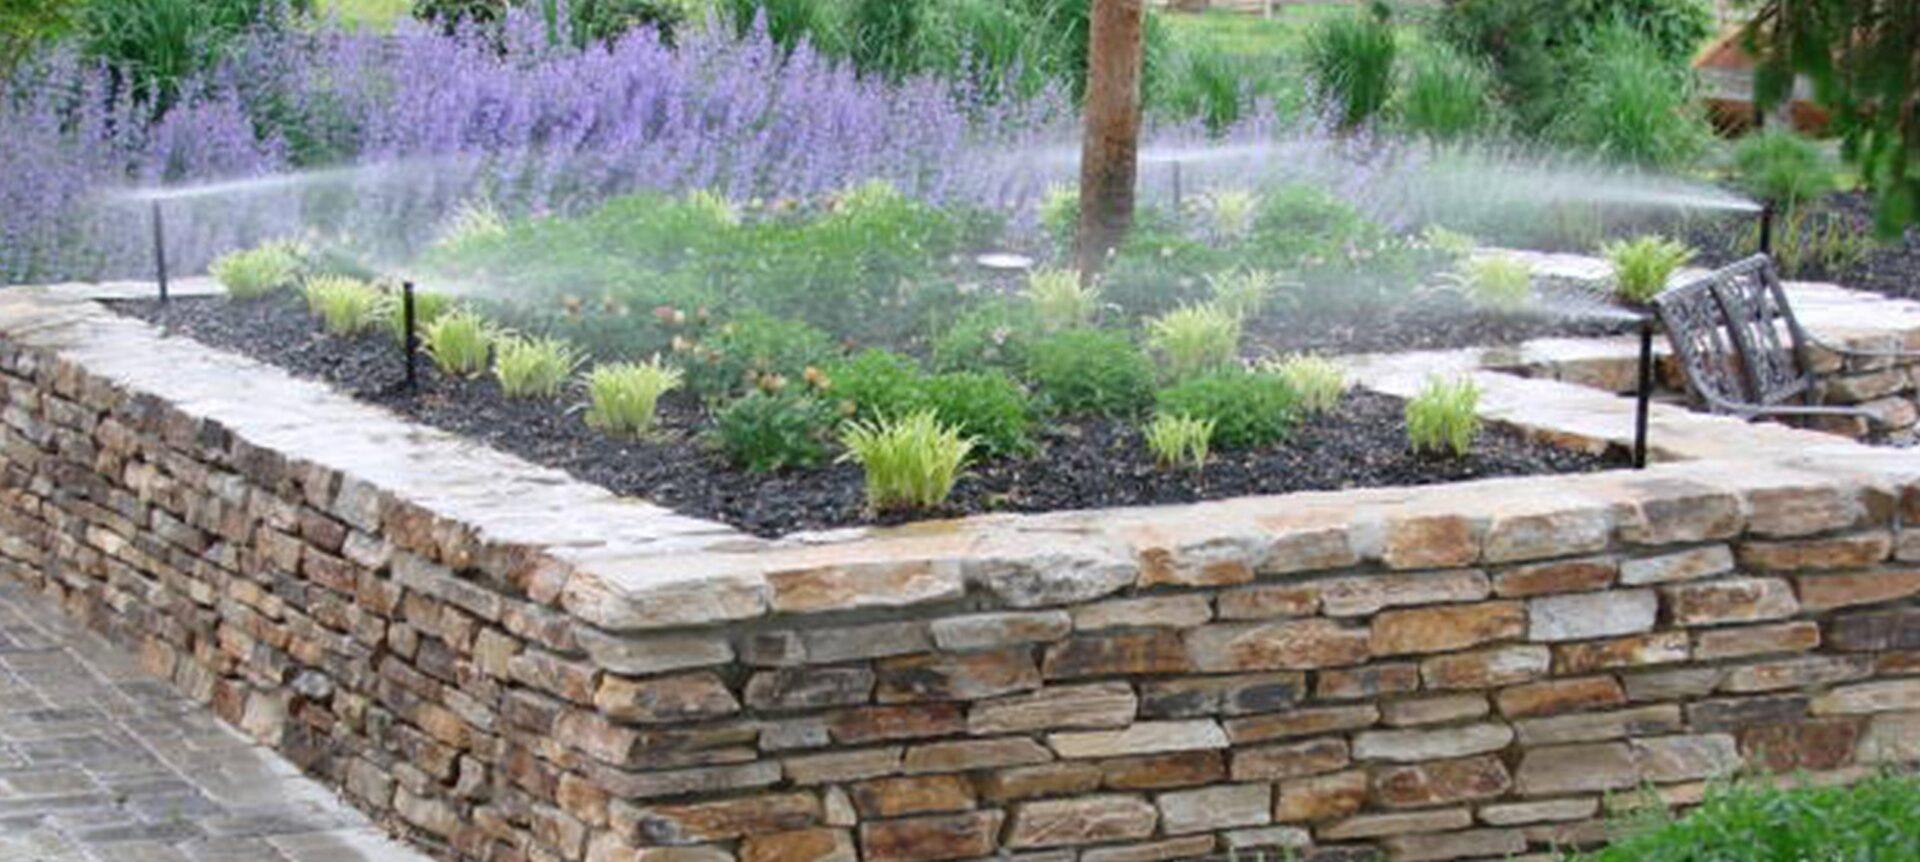 lawn irrigation system install